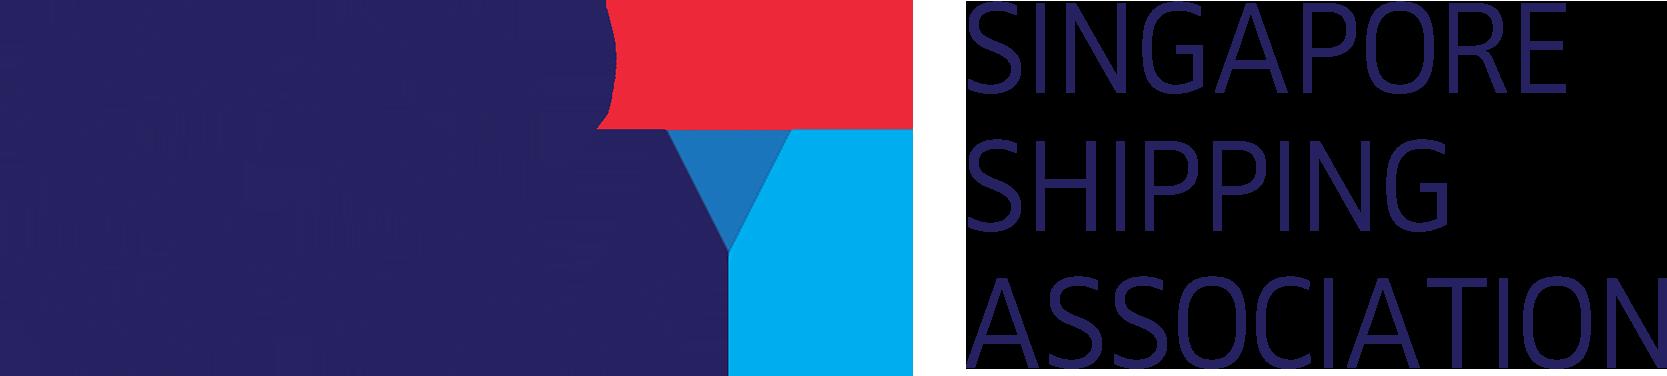 SSA Digital Vision & Sustainability Programme (DVSP)